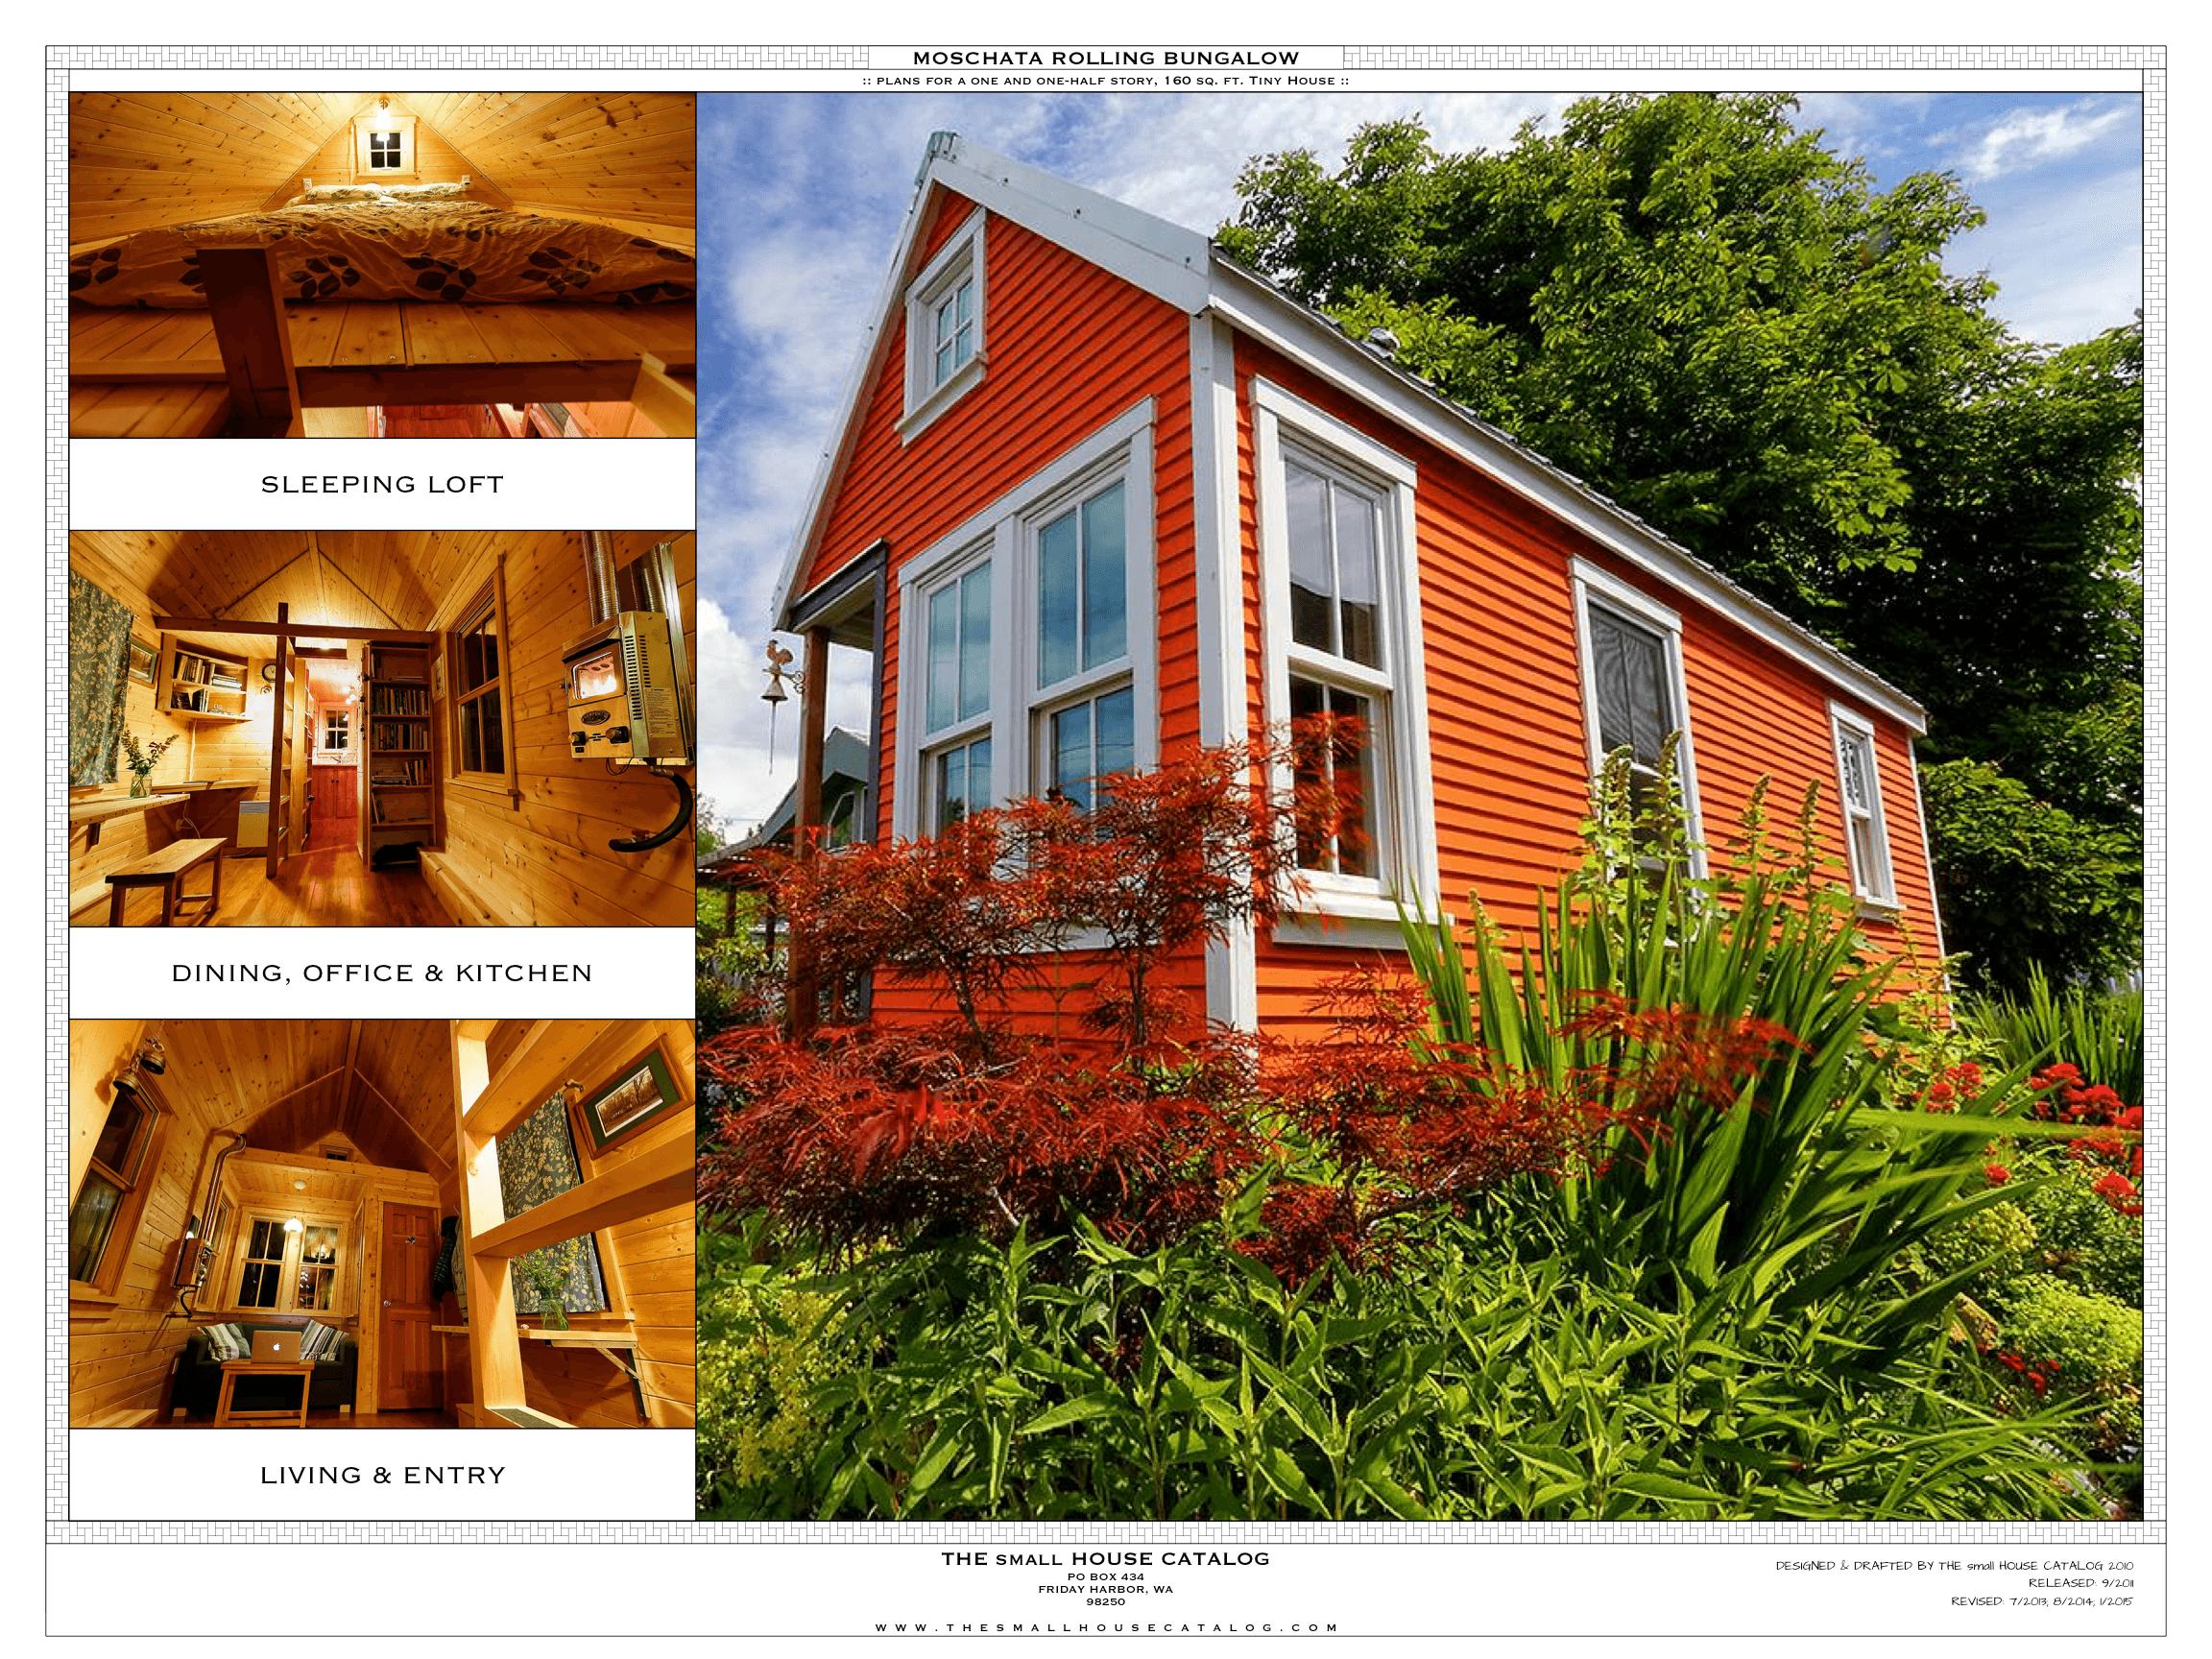 No 1 Tiny House Plan The Moschata The Small House Catalog